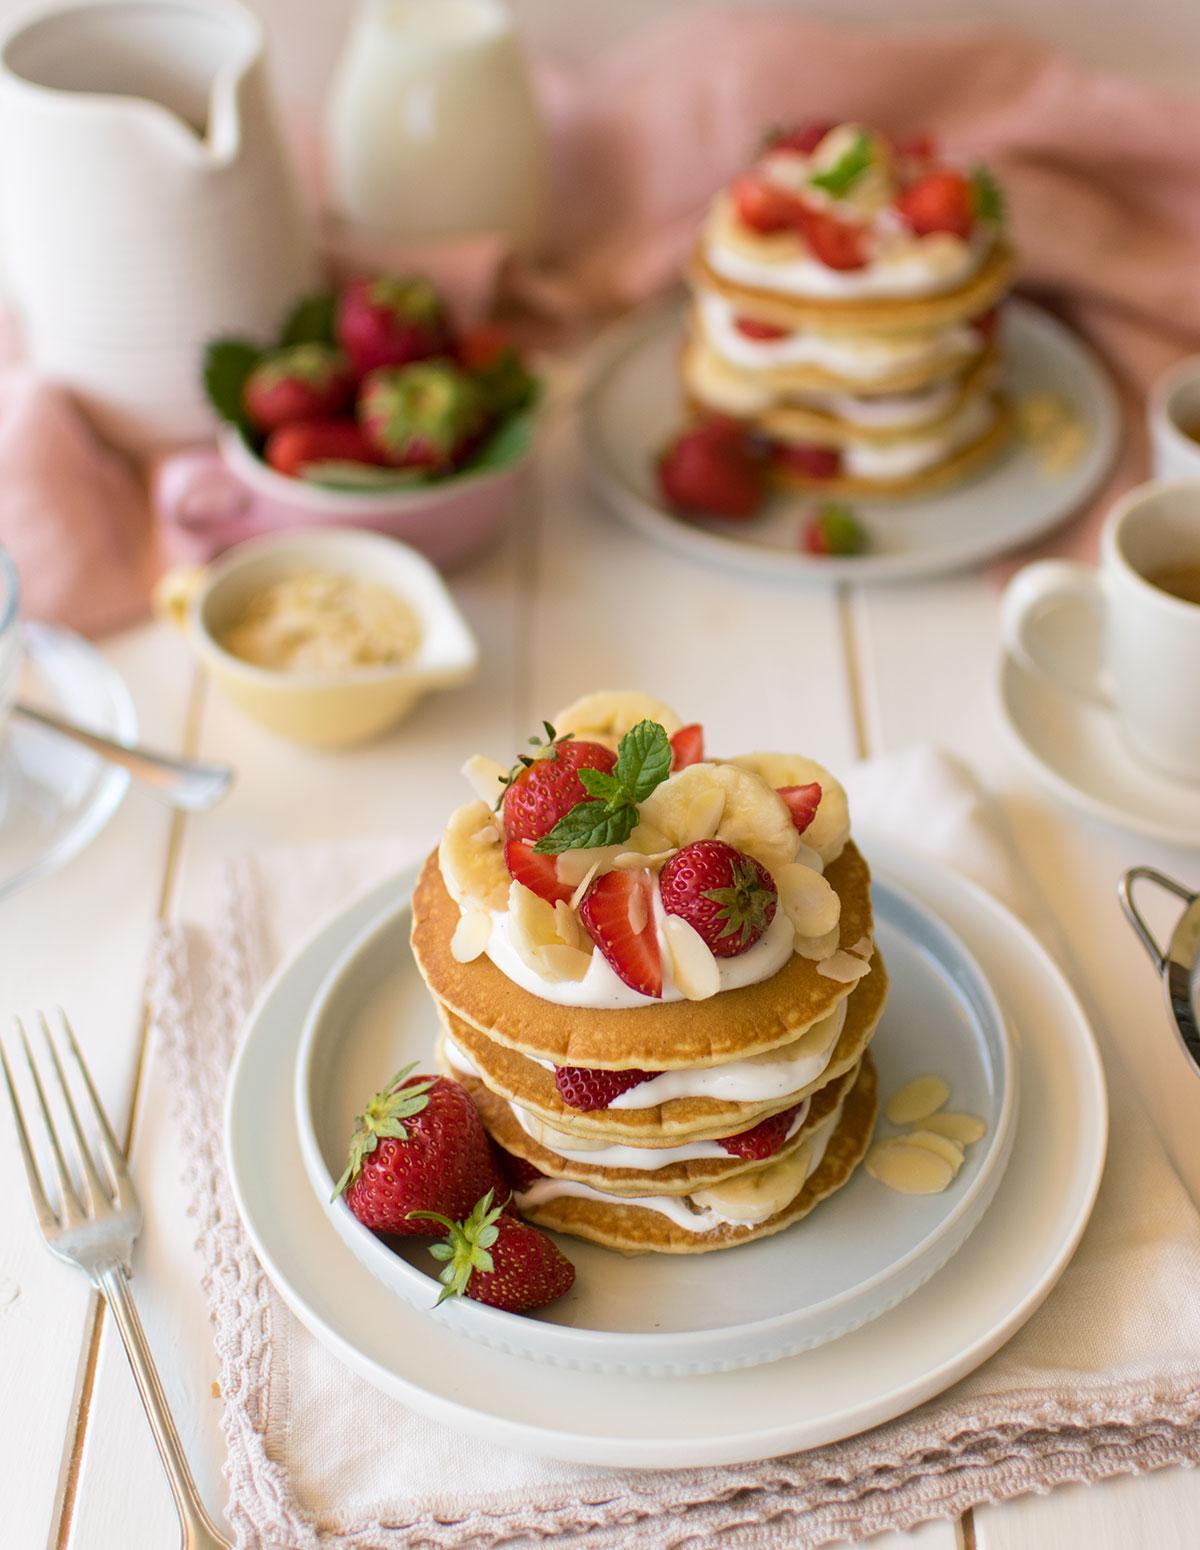 pancakes_fragole_banana_mandorle_ricetta